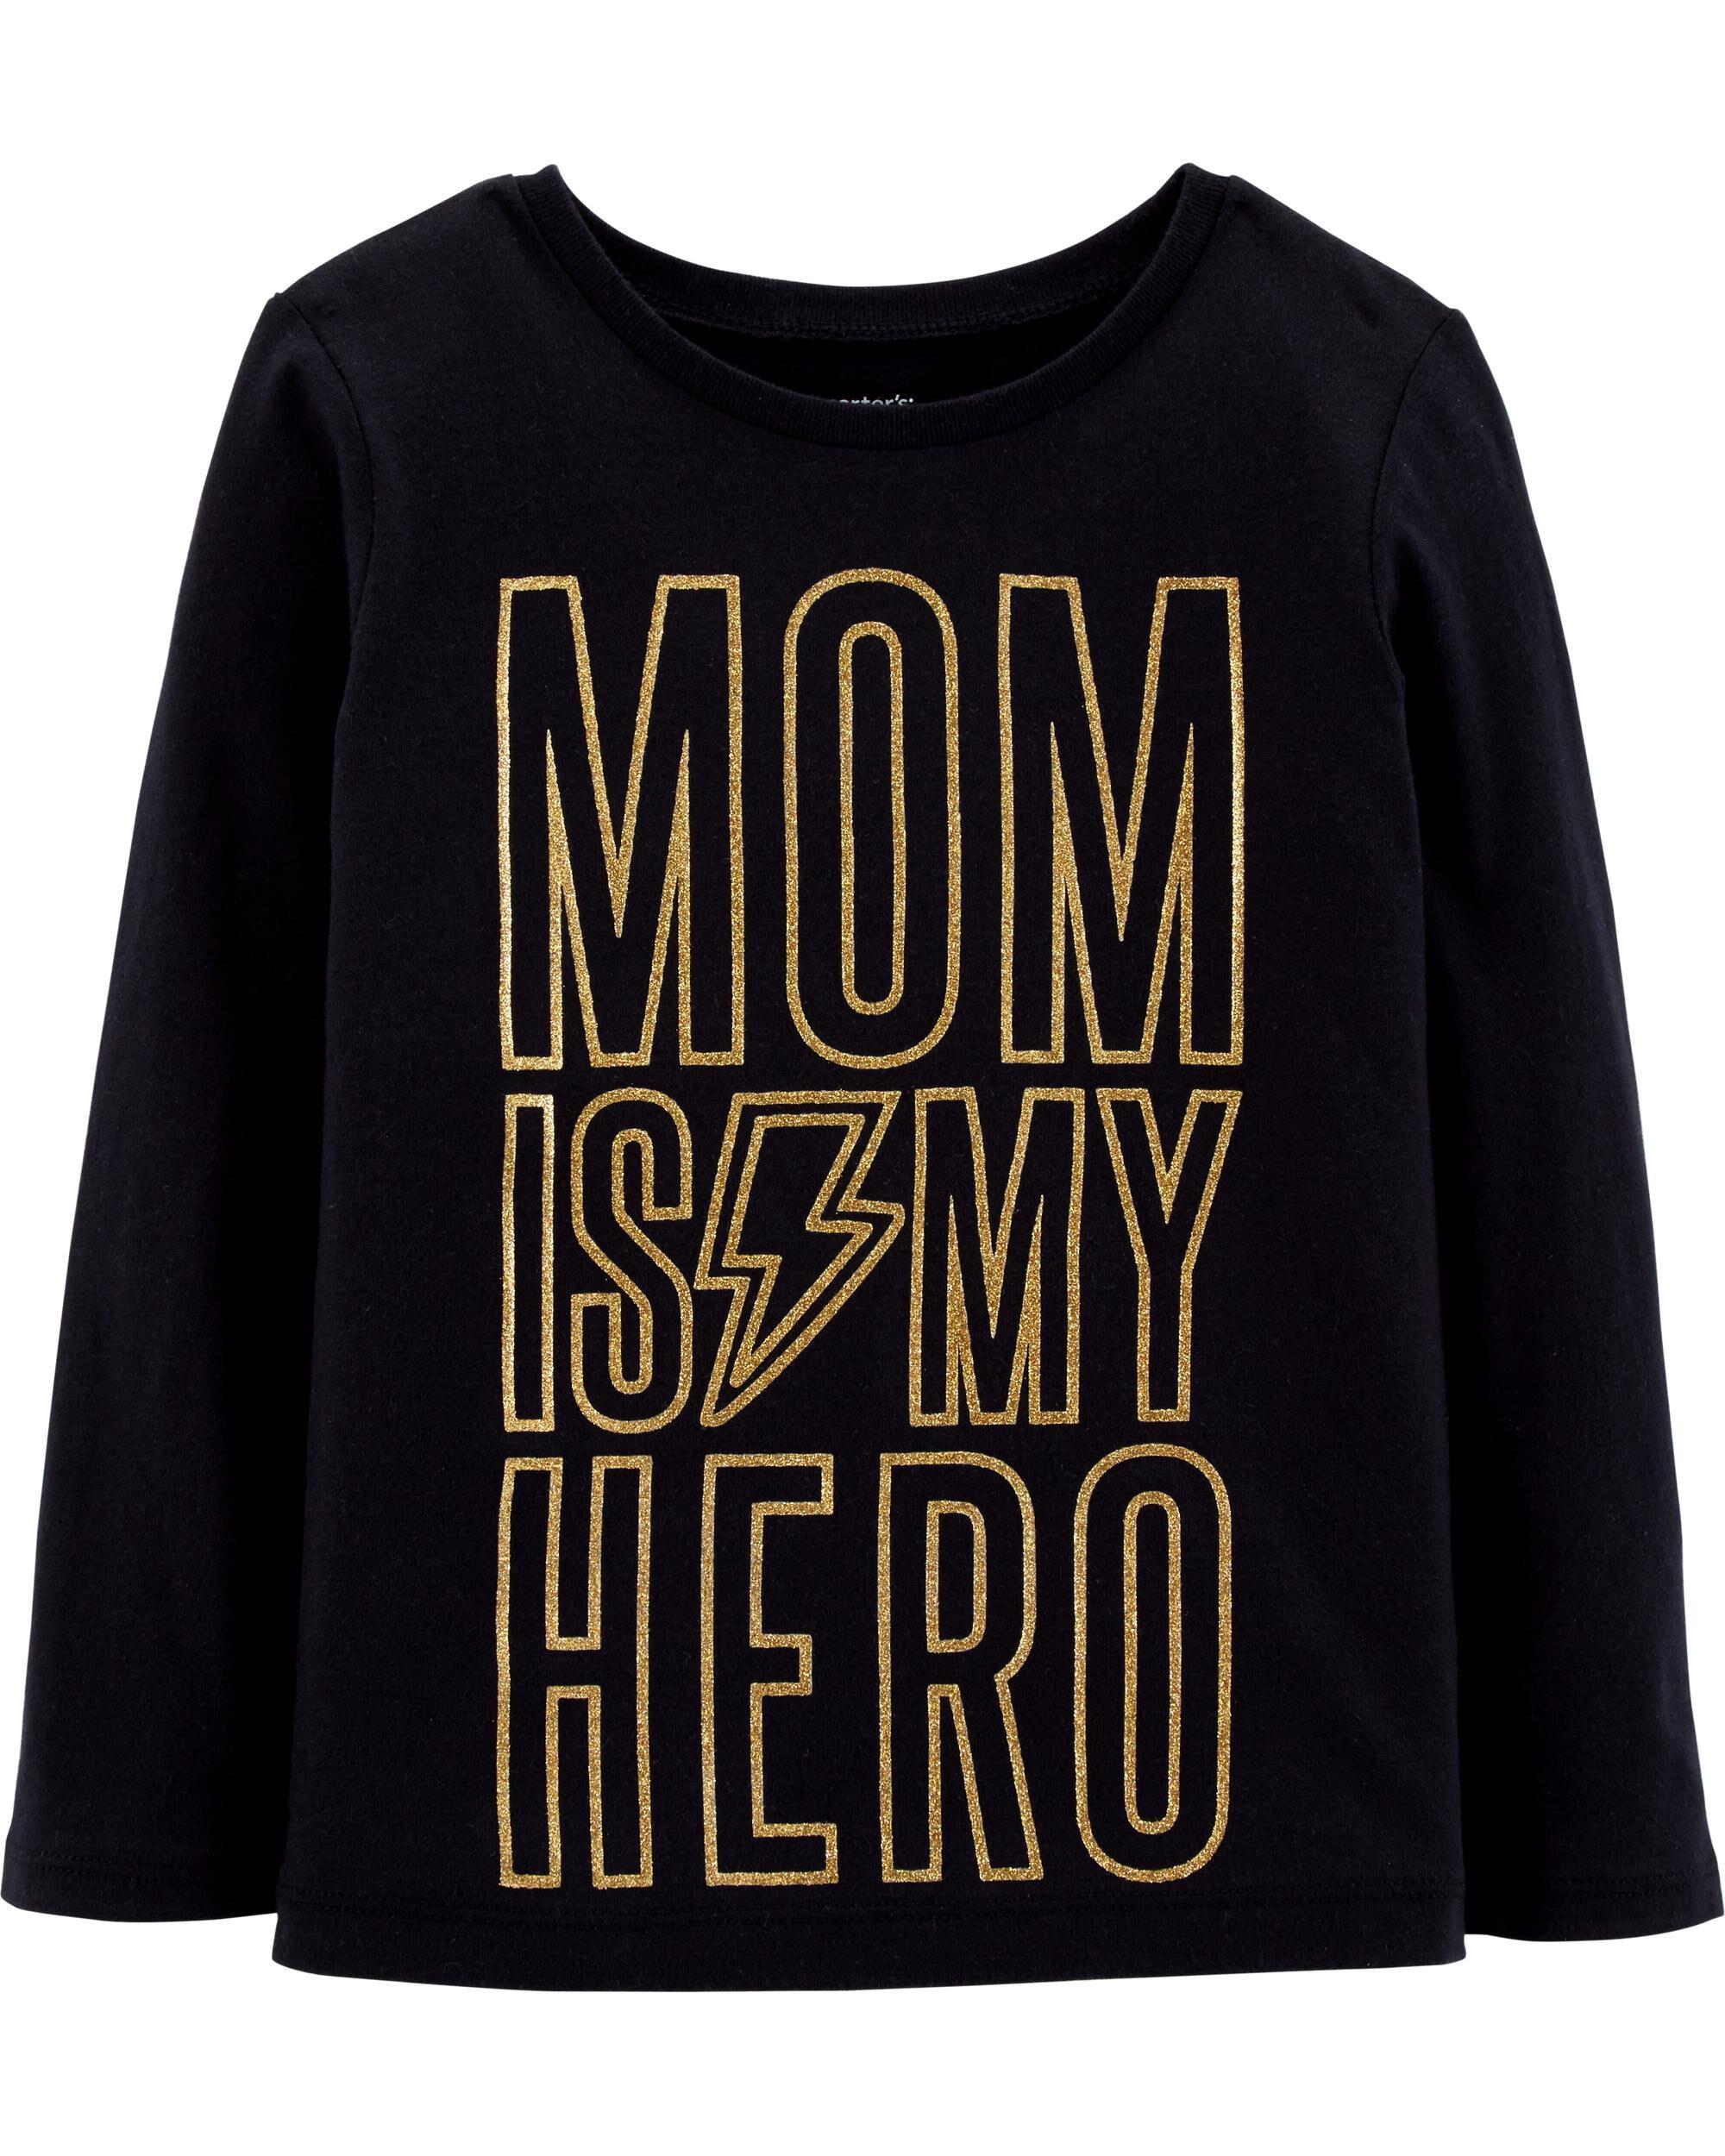 Mom Is My Hero Glitter Jersey Tee